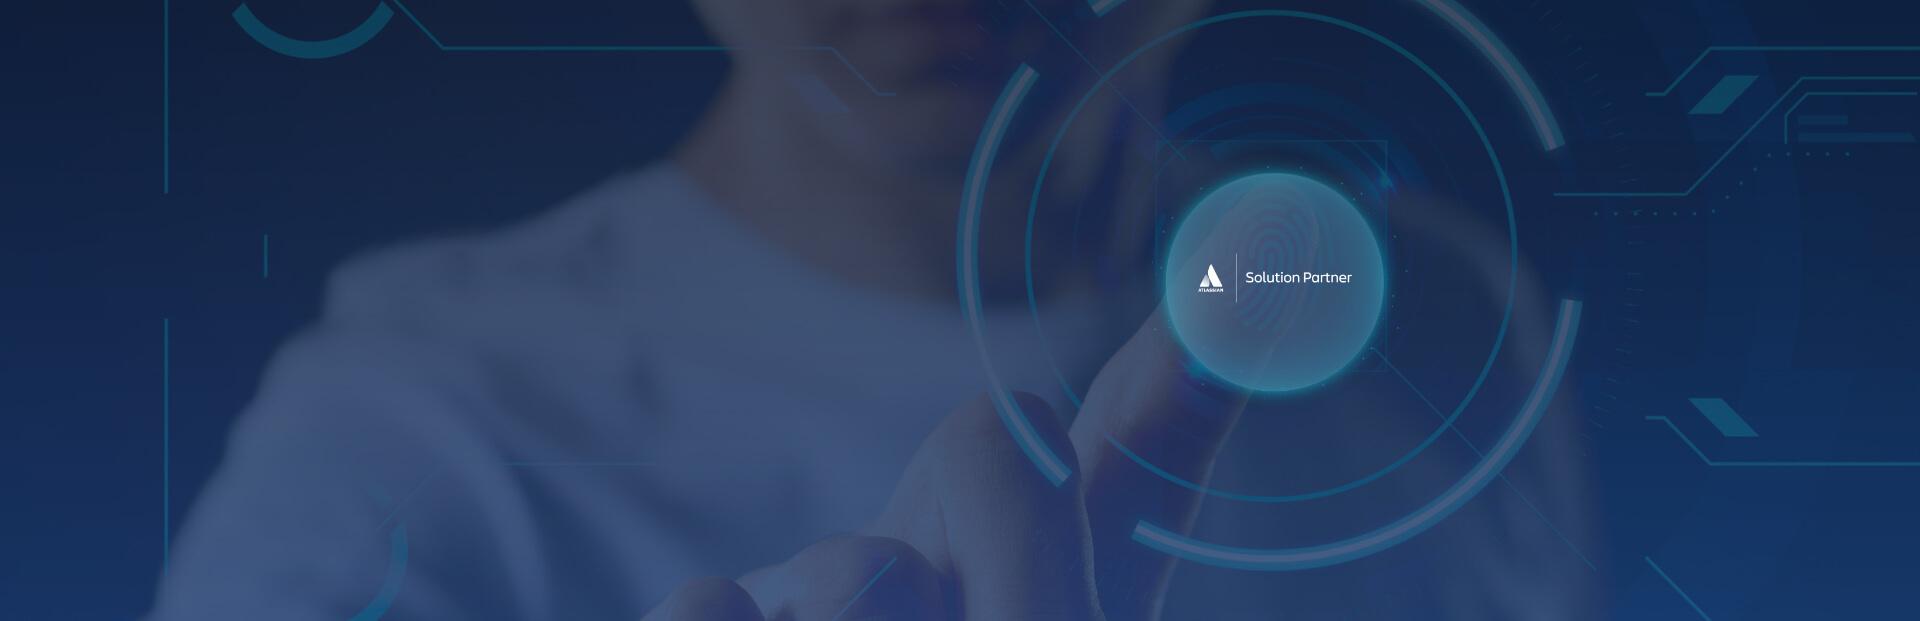 Atlassian Services